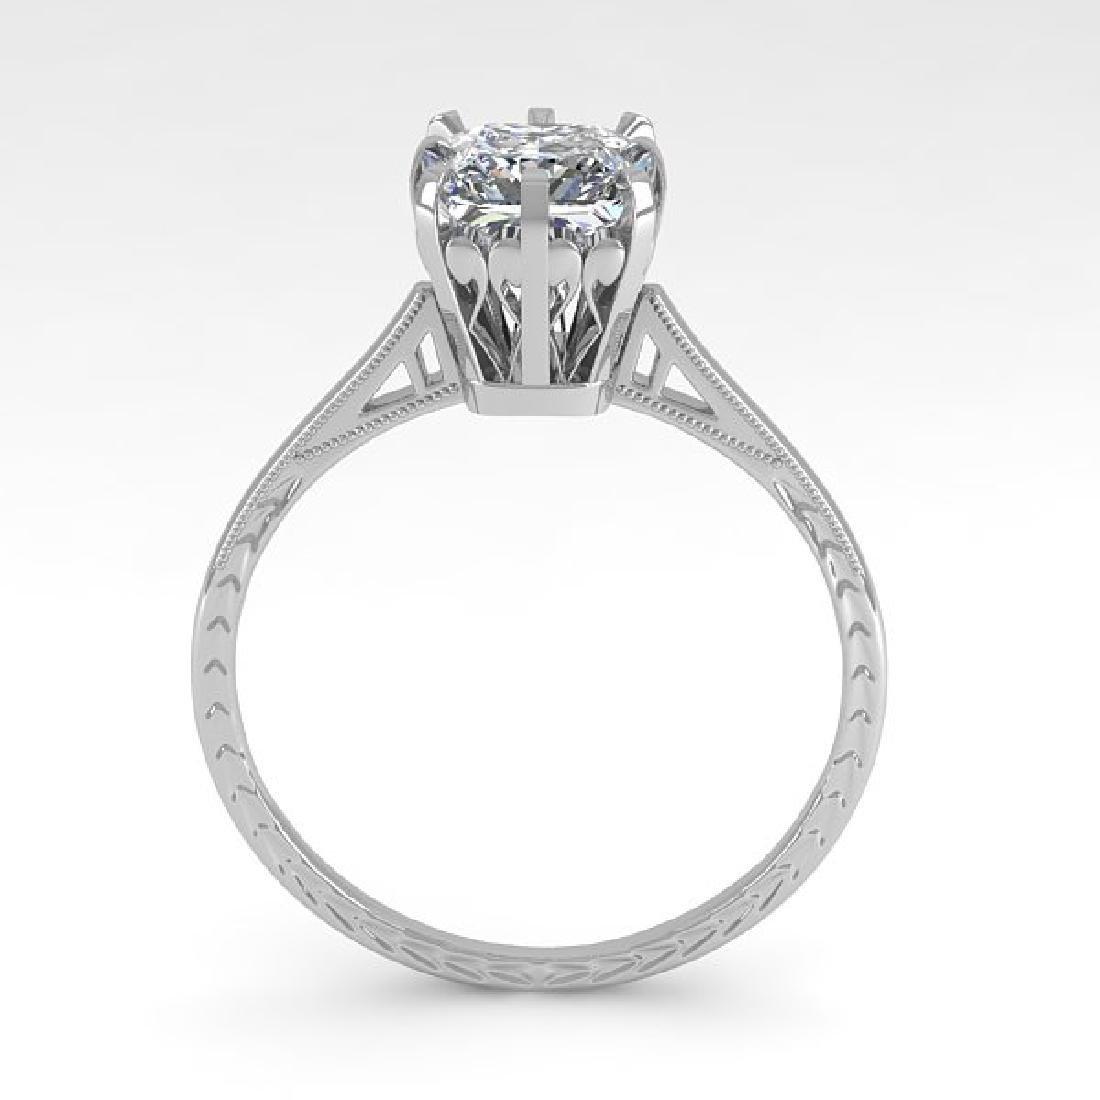 1.0 CTW VS/SI Princess Diamond Solitaire Ring 14K White - 3